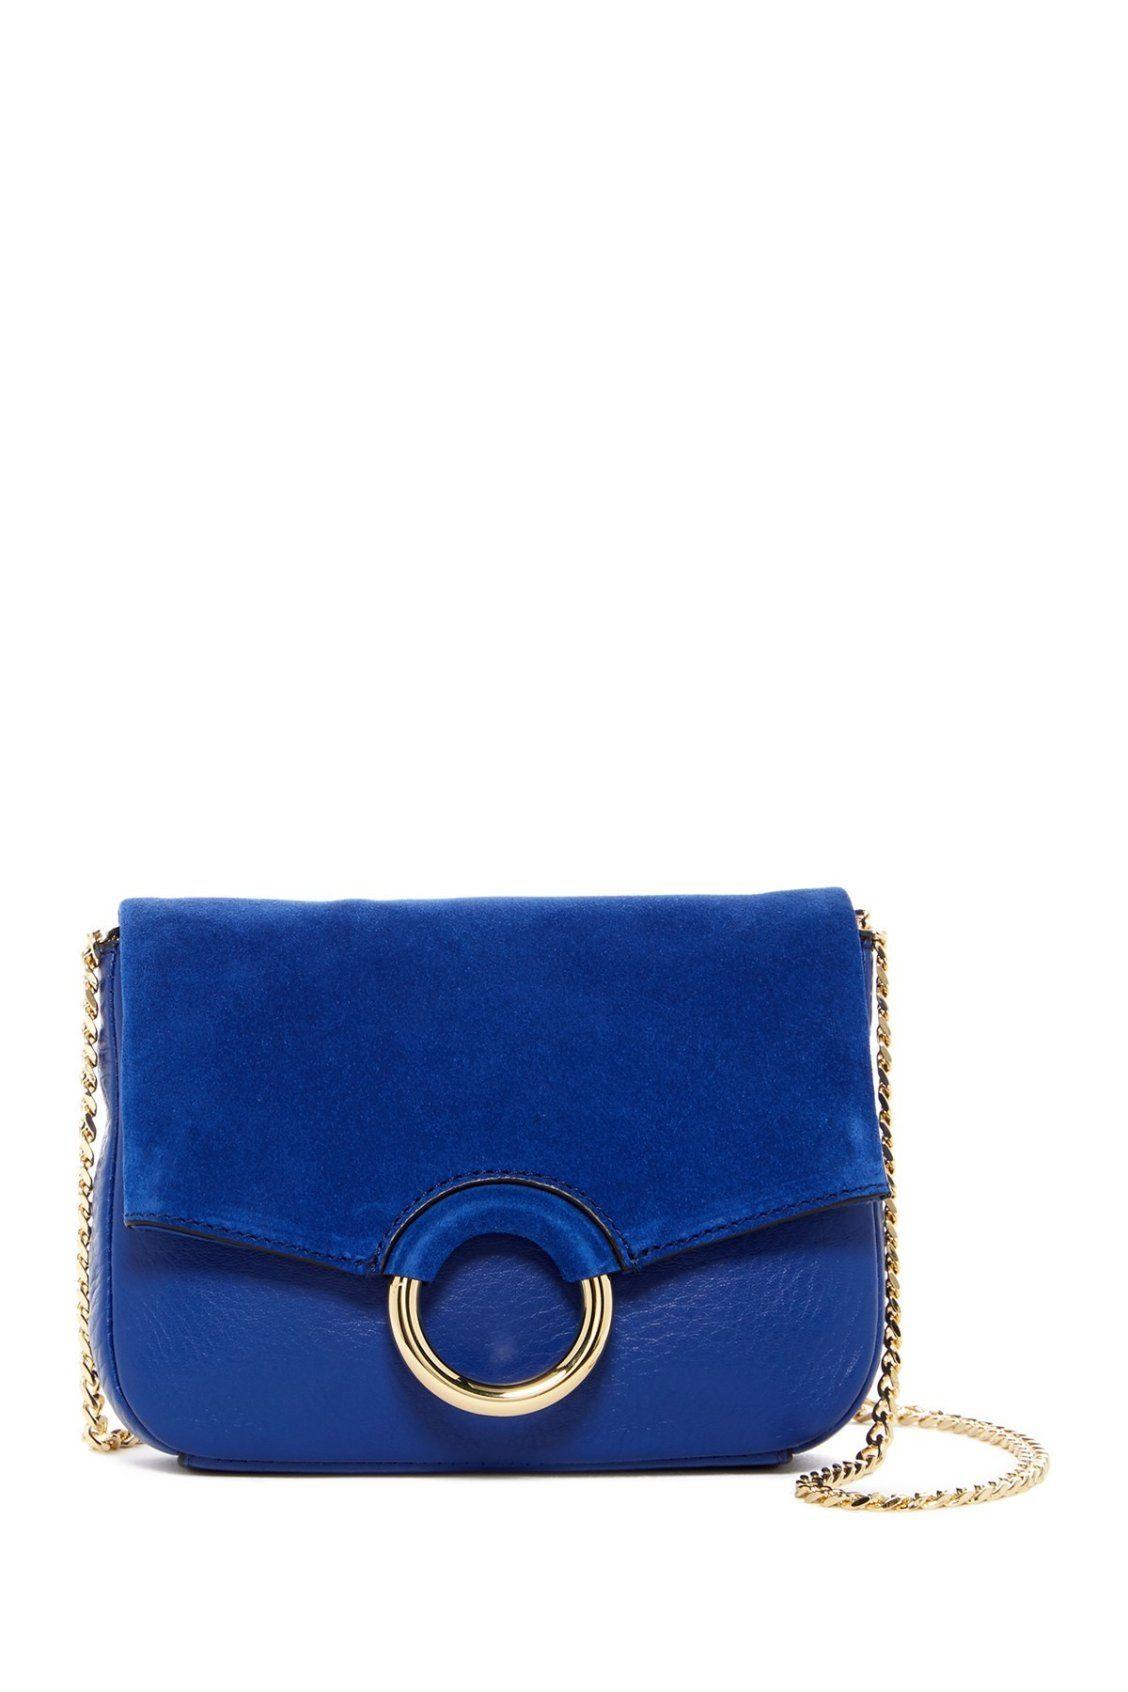 4c6c4aca9817 Beautiful Blue Vince Camuto Adina Leather Crossbody Bag